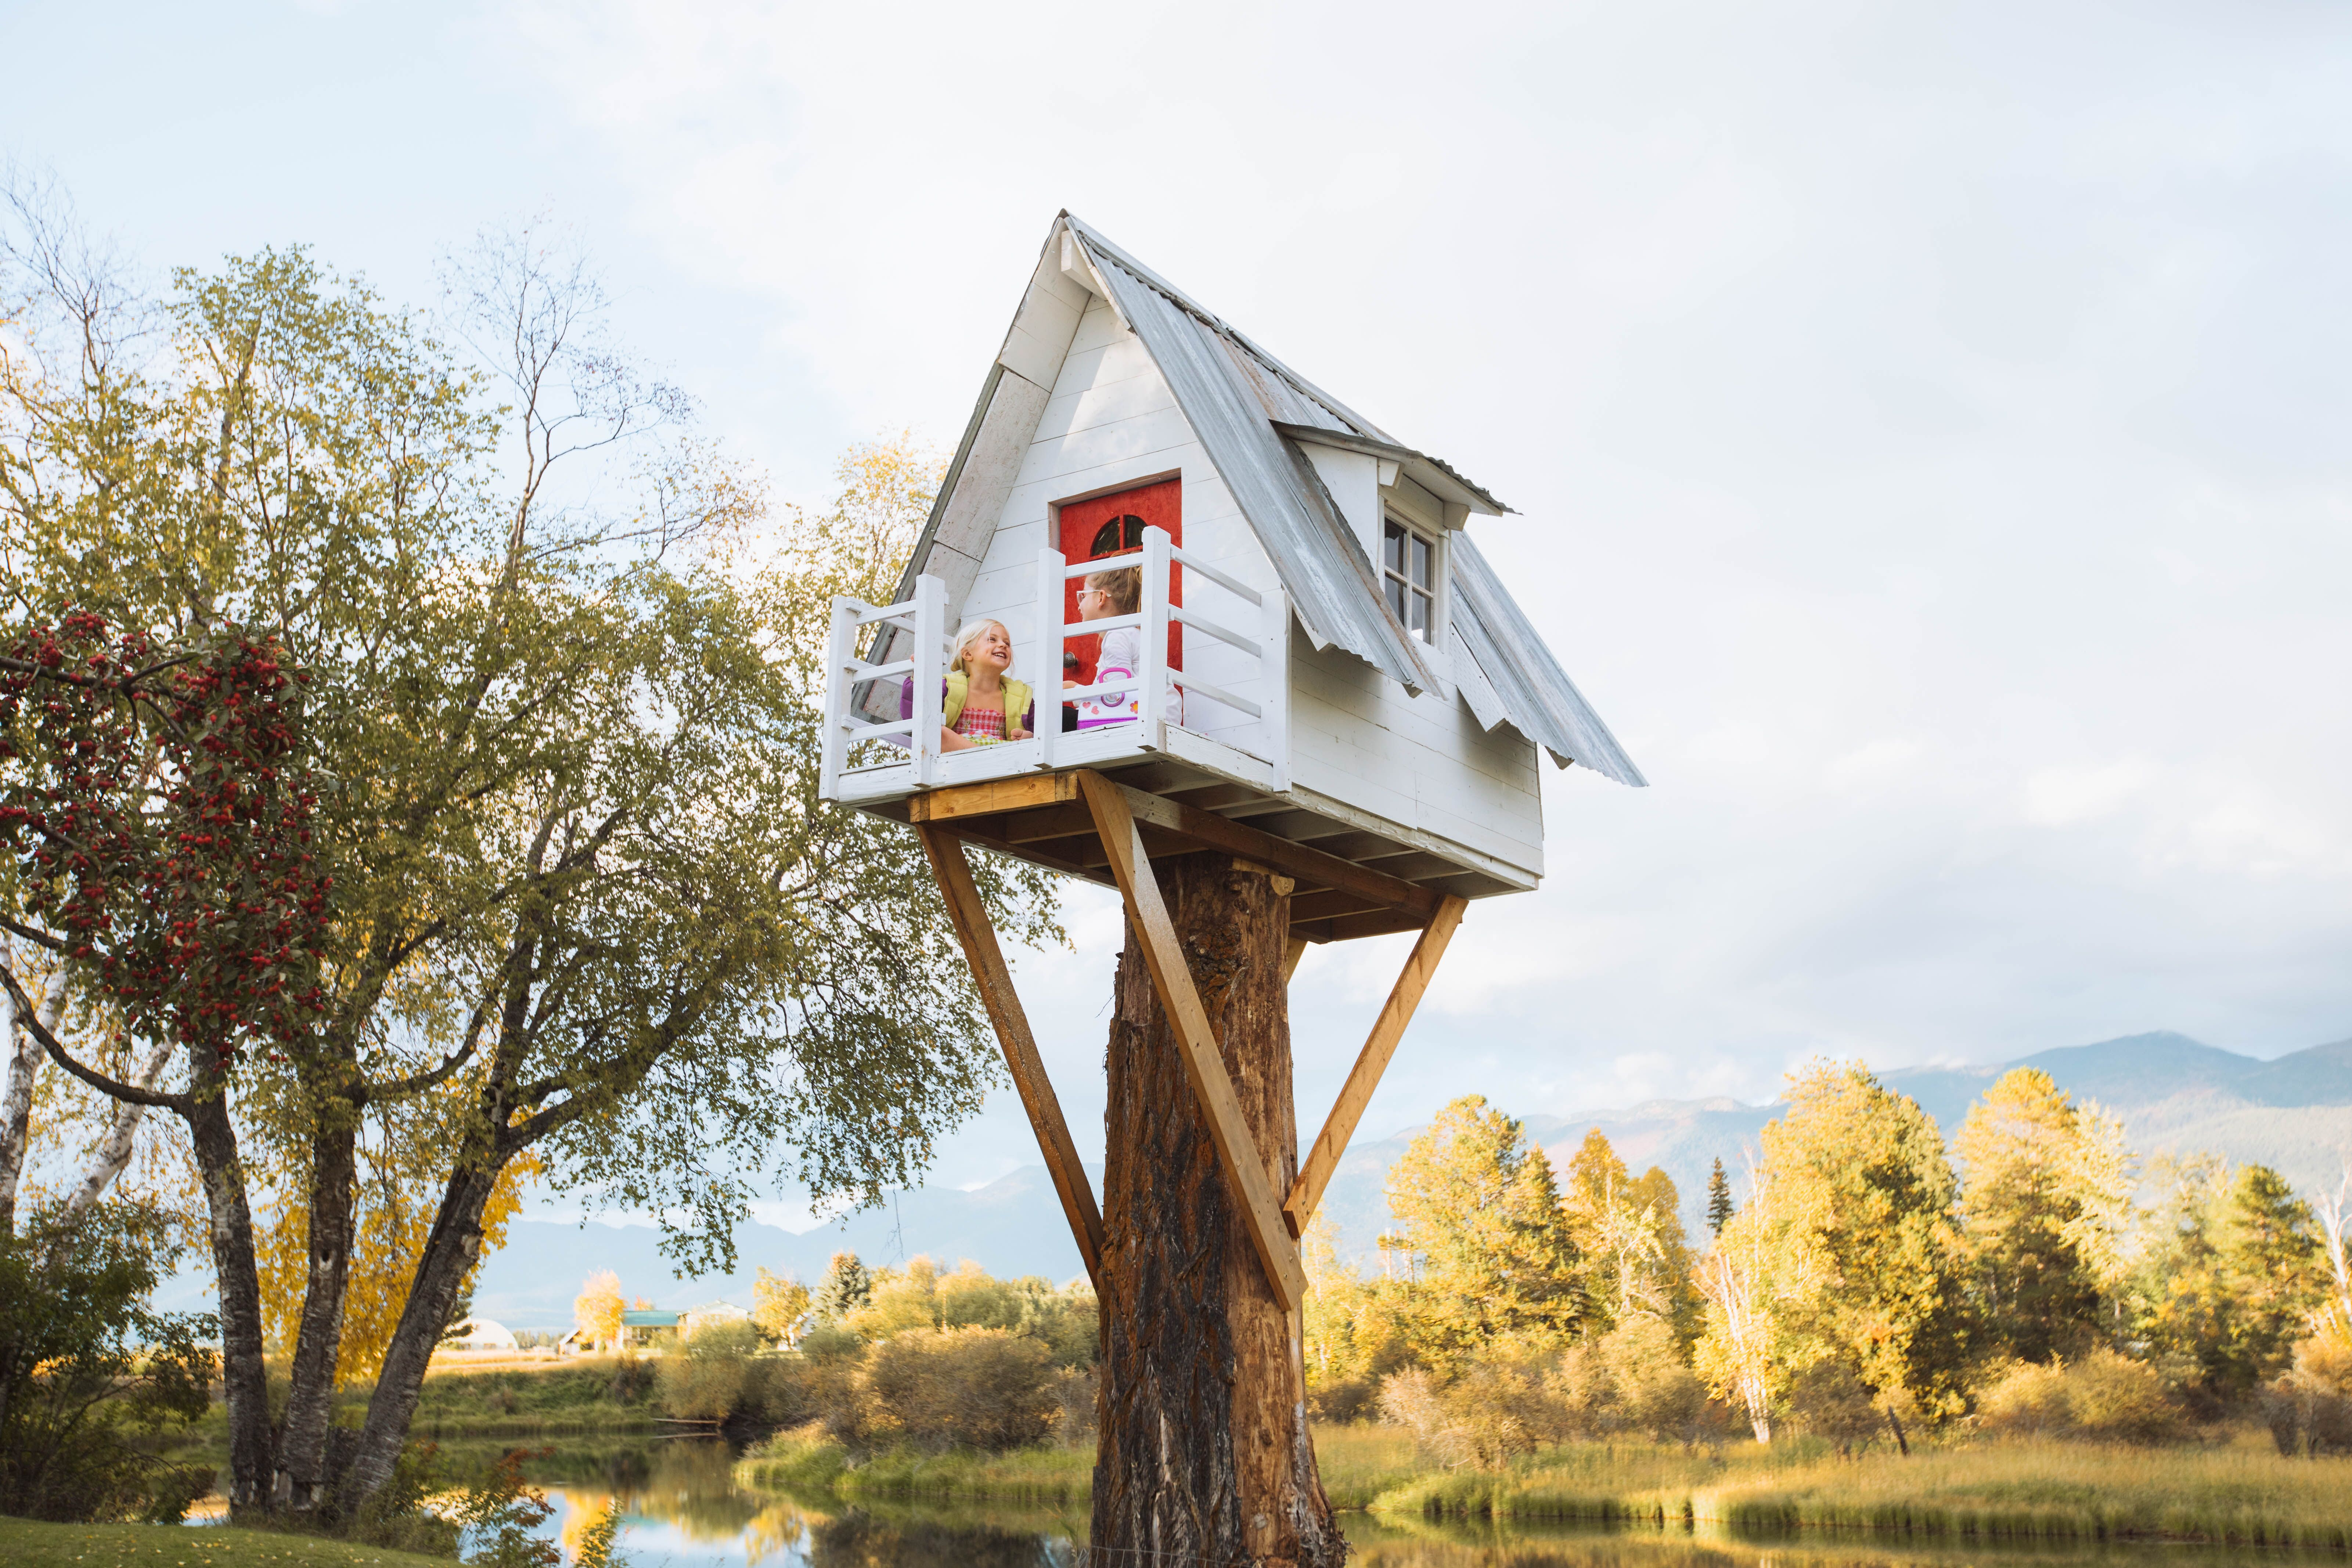 Isaac Johnston's treehouse